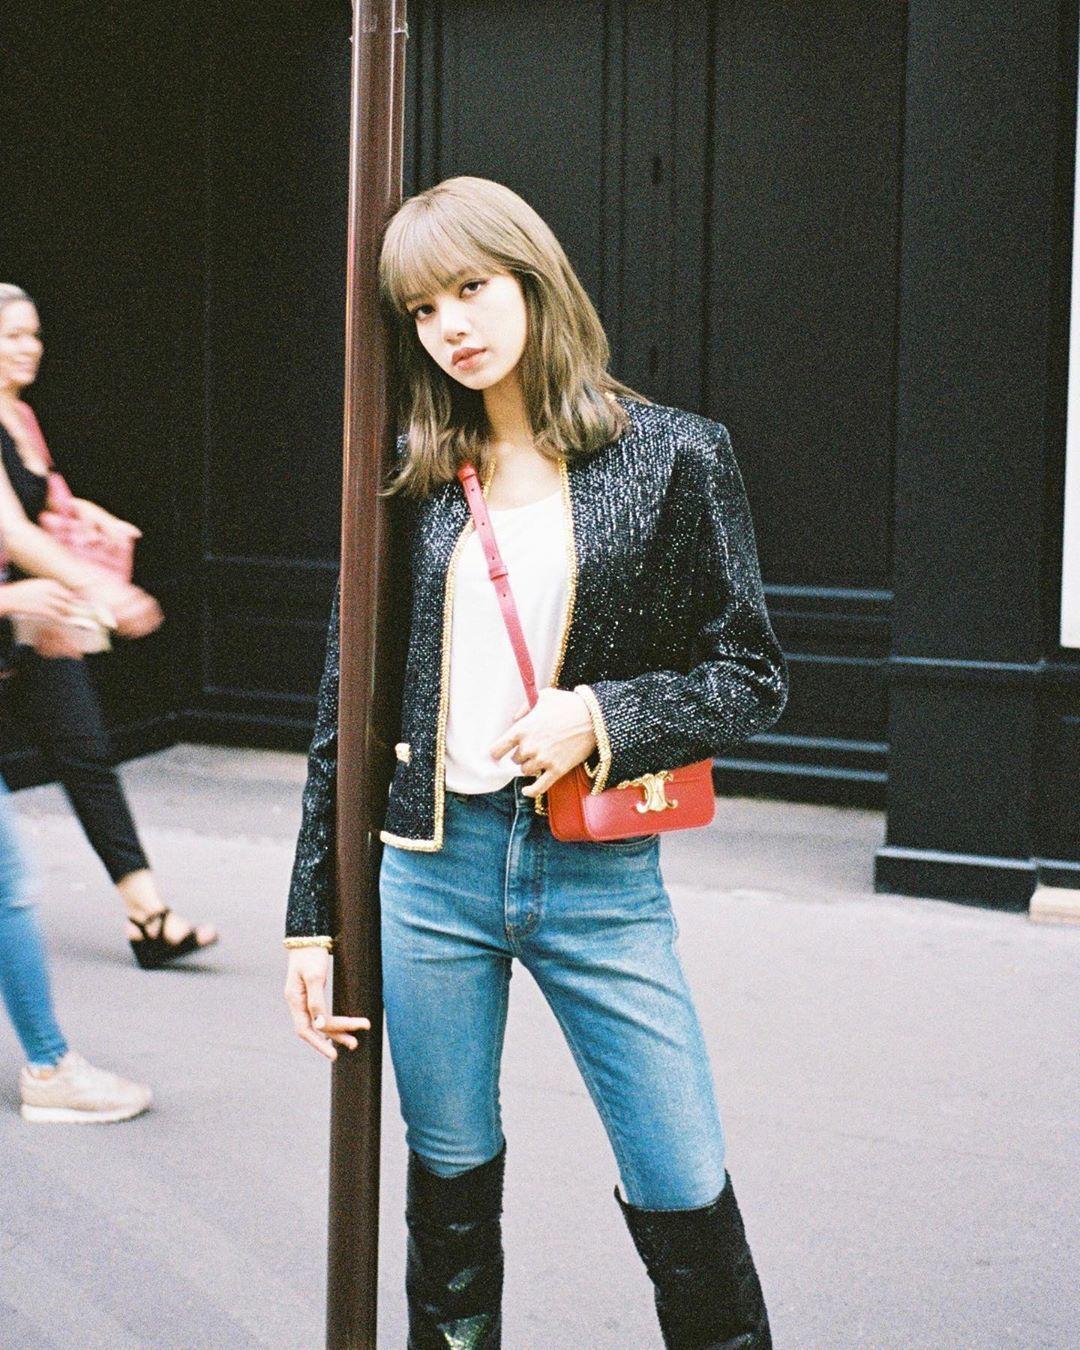 Lisa獲邀前往巴黎出席CELINE 2020春夏男裝秀。圖/取自IG